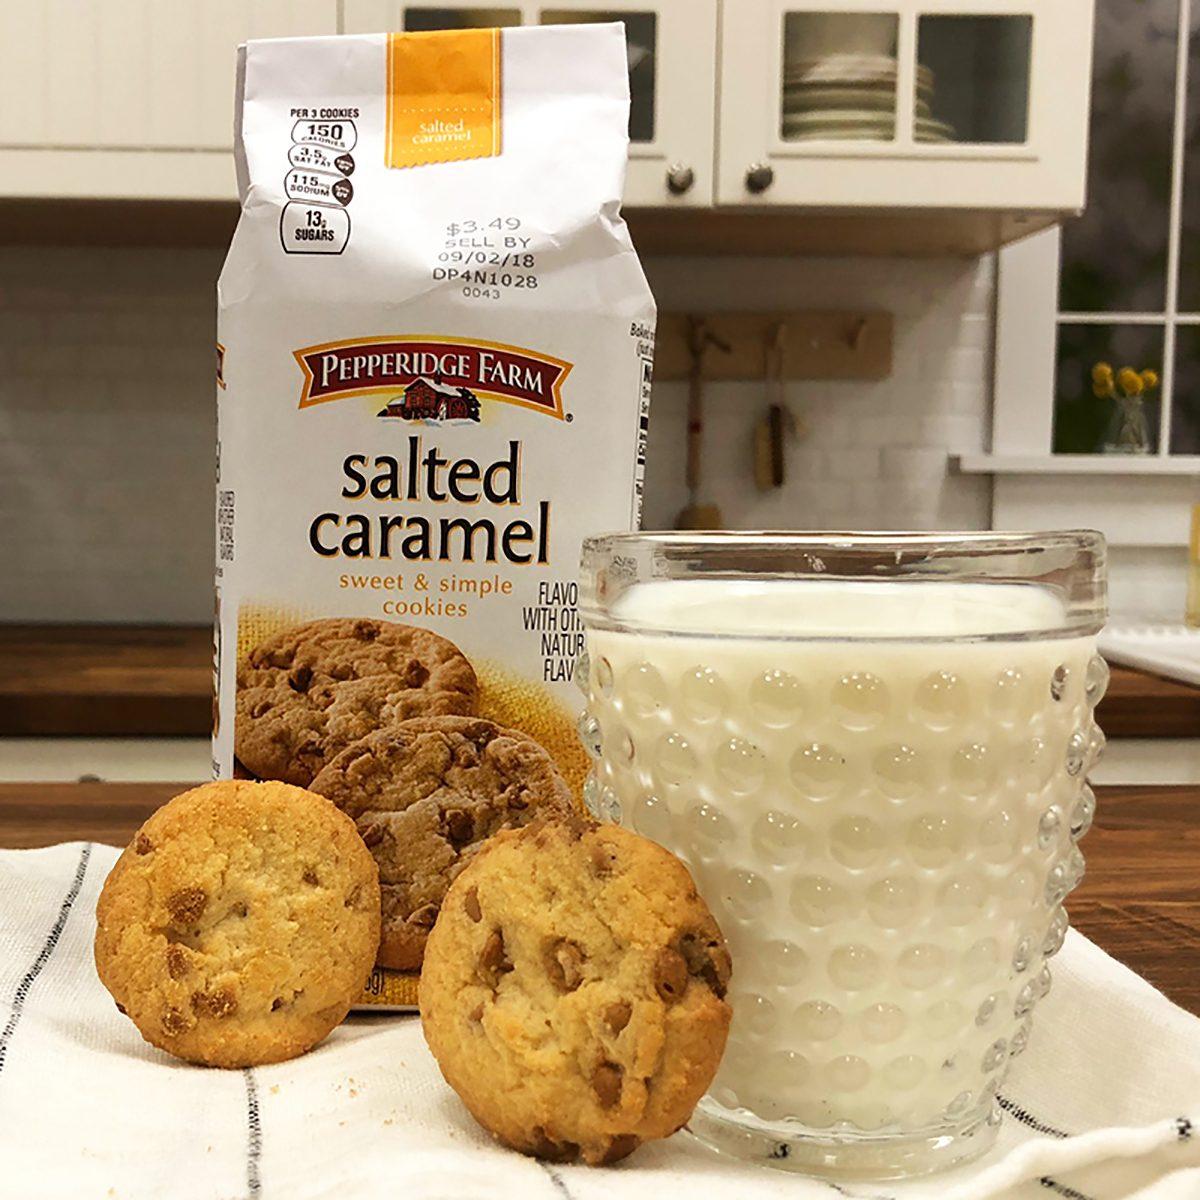 Pepperidge Farm Salted Caramel Cookies